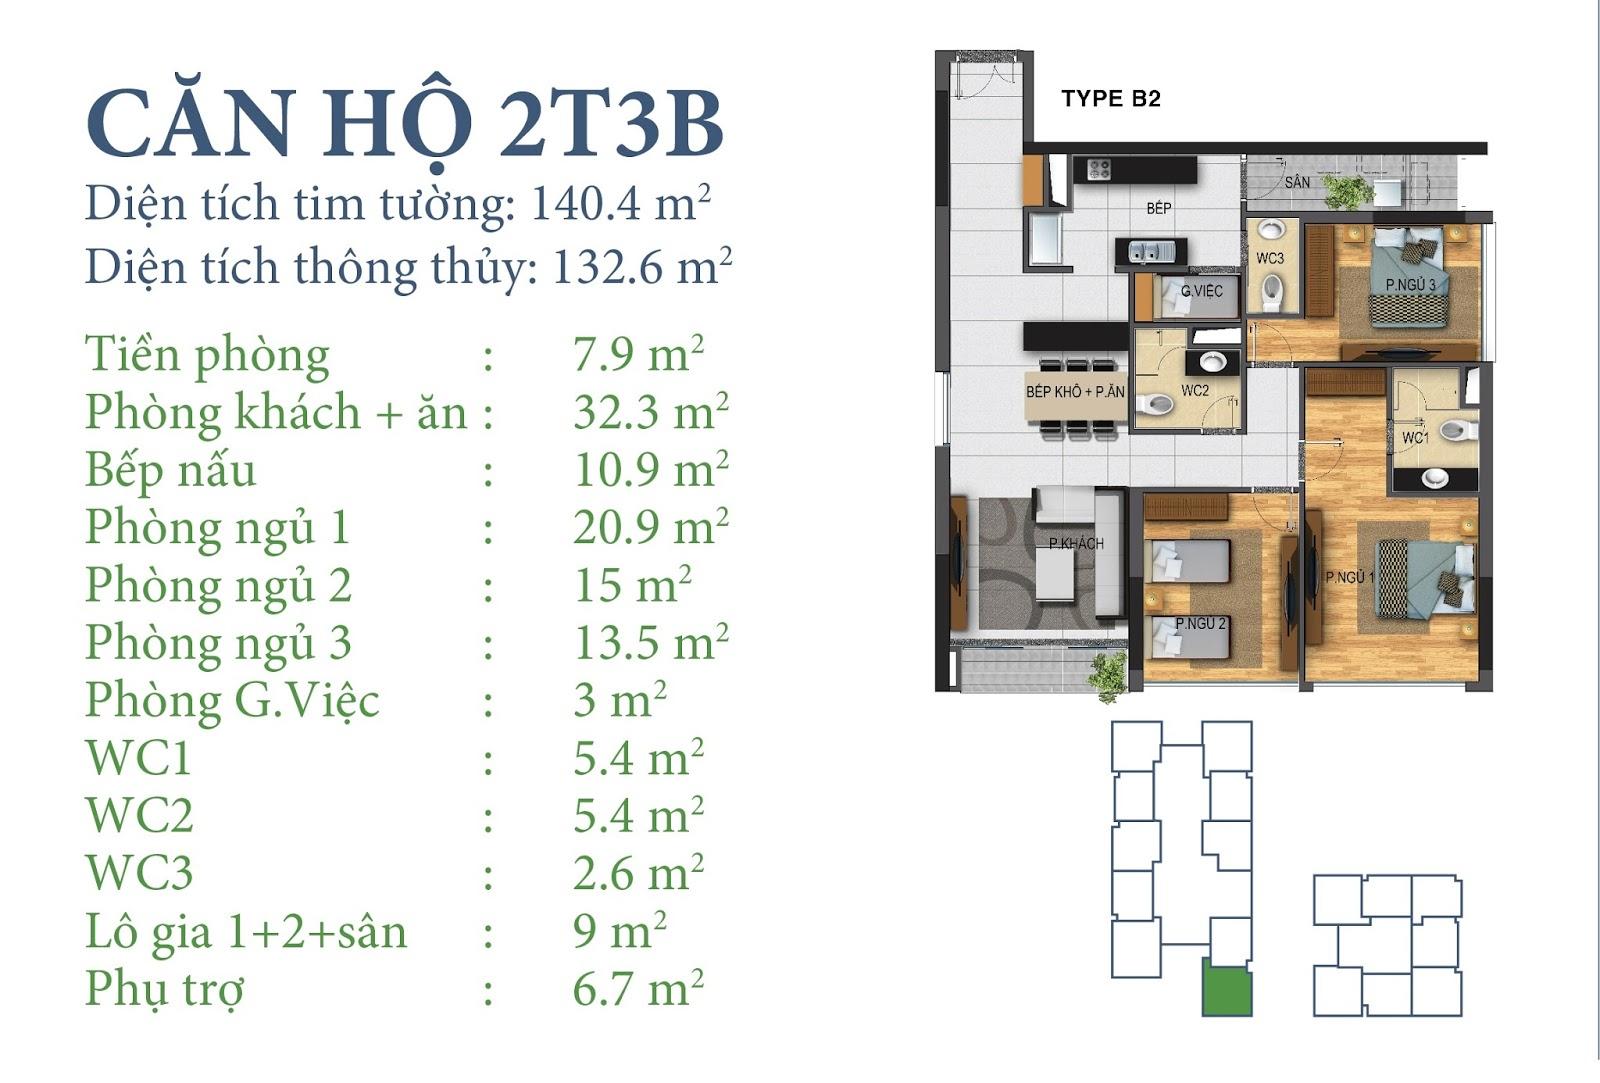 2T3B-horizon-tower-ngoai-giao-doan